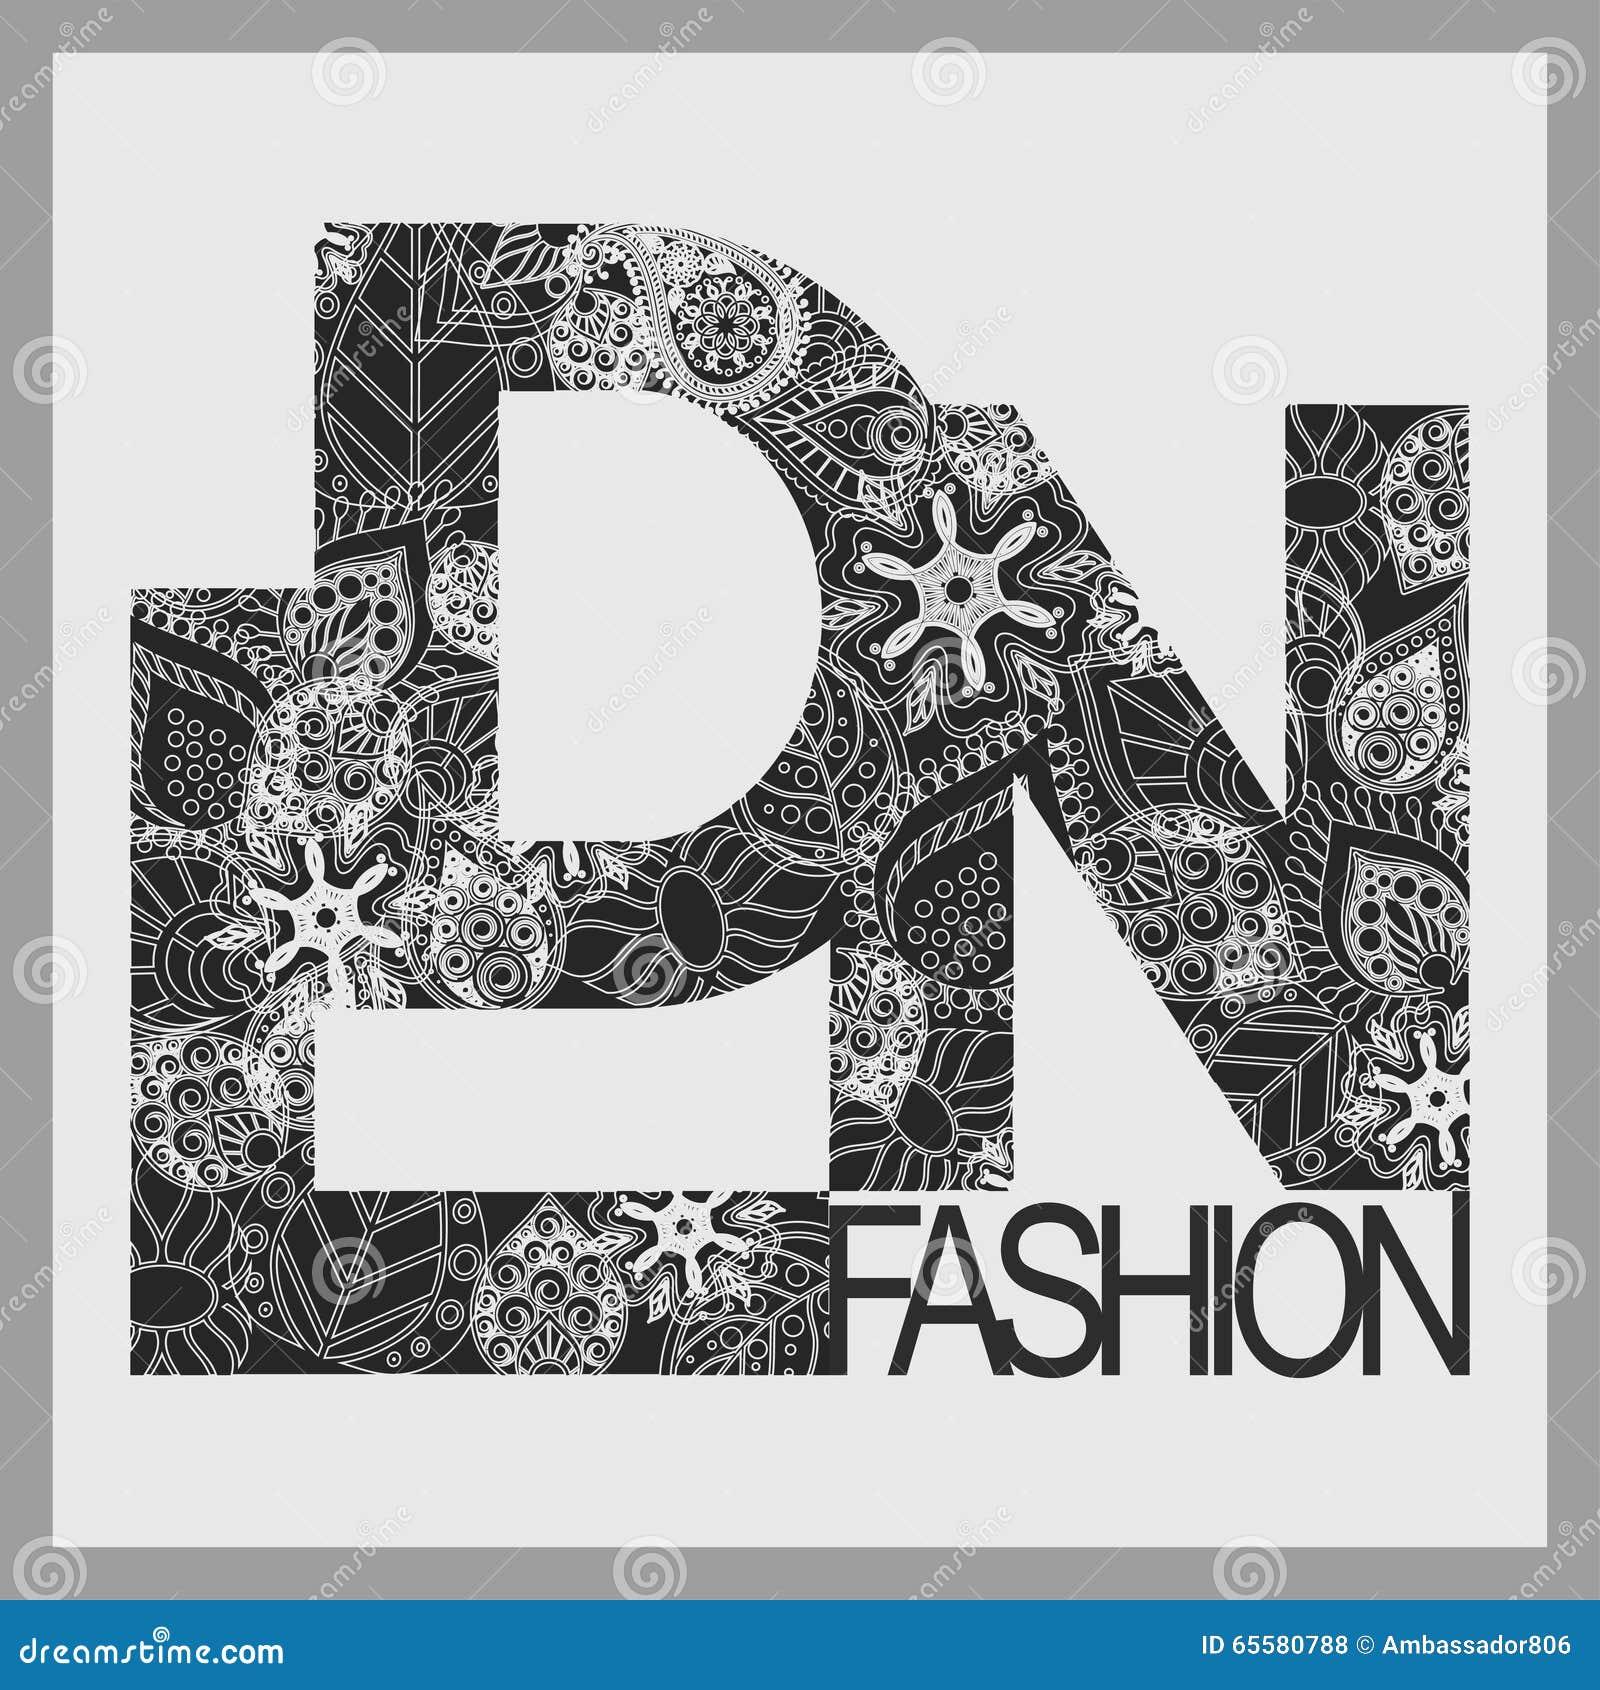 Shirt design london - London T Shirt Fashion Typography